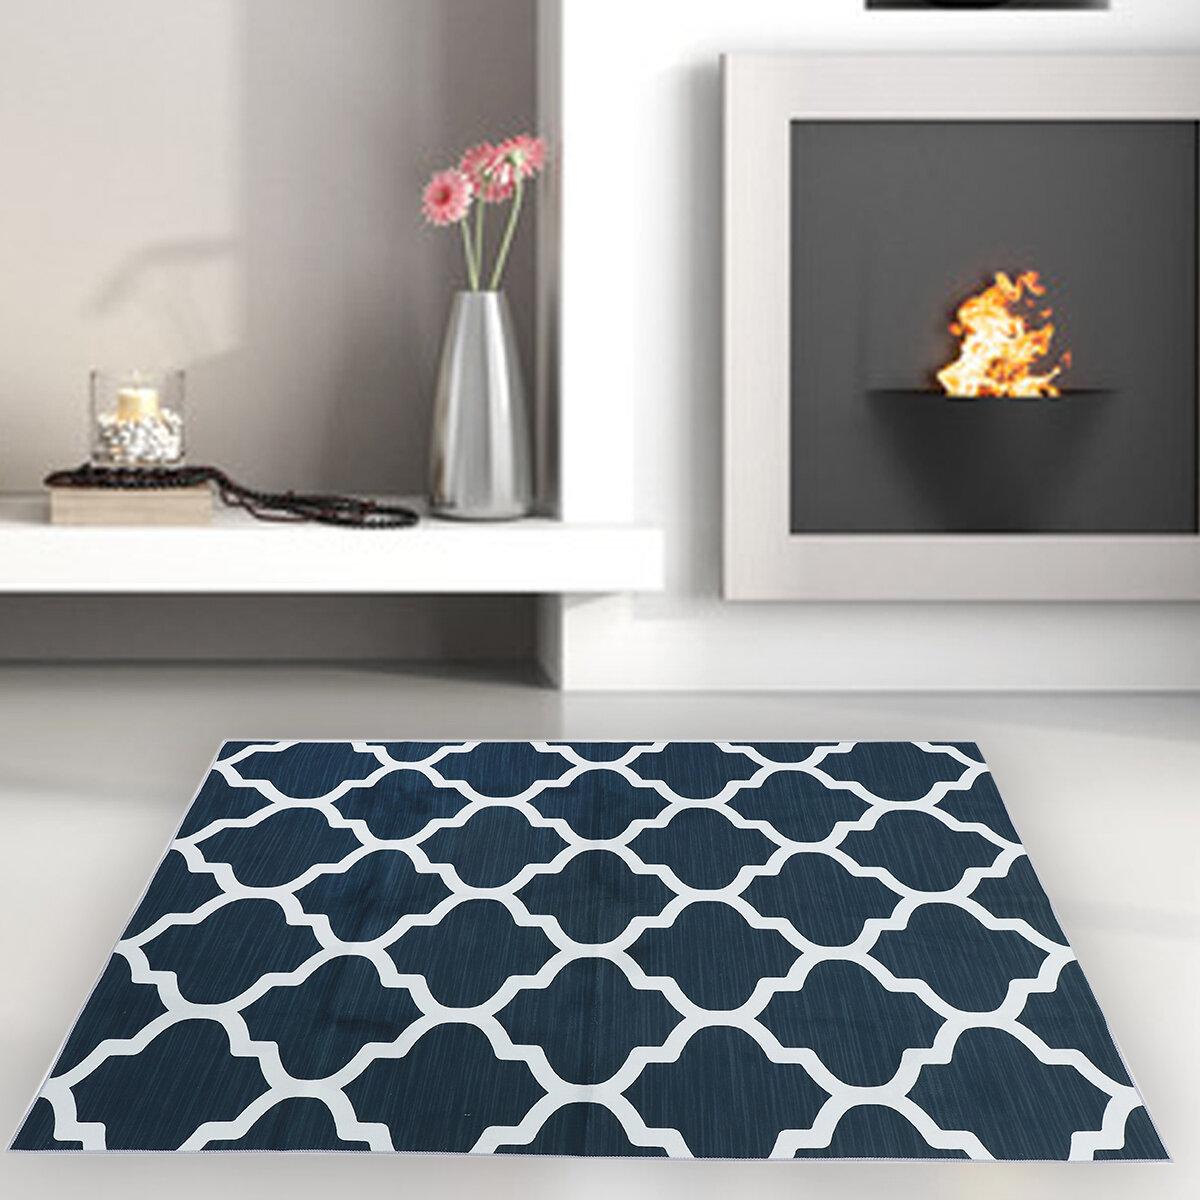 Modern Geometric Trellis Grey Black White Area Rug Contemporary Carpet Soft Mat for Home Living Room Bedroom Decor